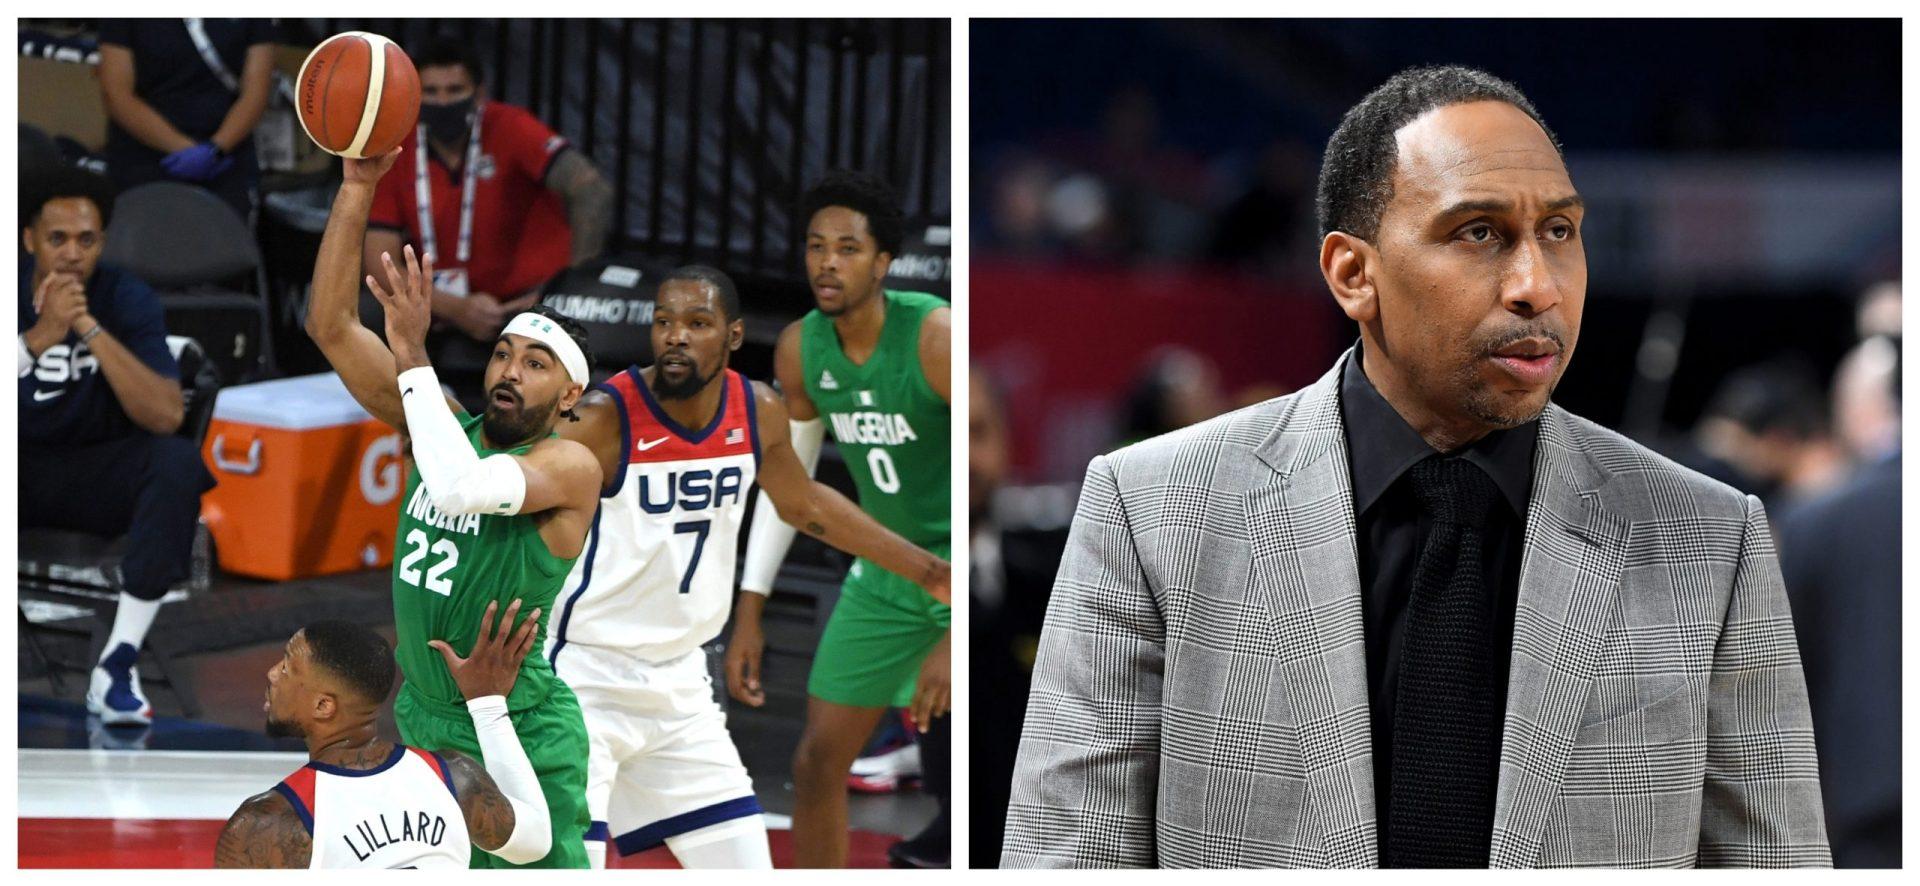 Team Nigeria slams Stephen A Smith over disrespecting segment - THE SPORTS ROOM